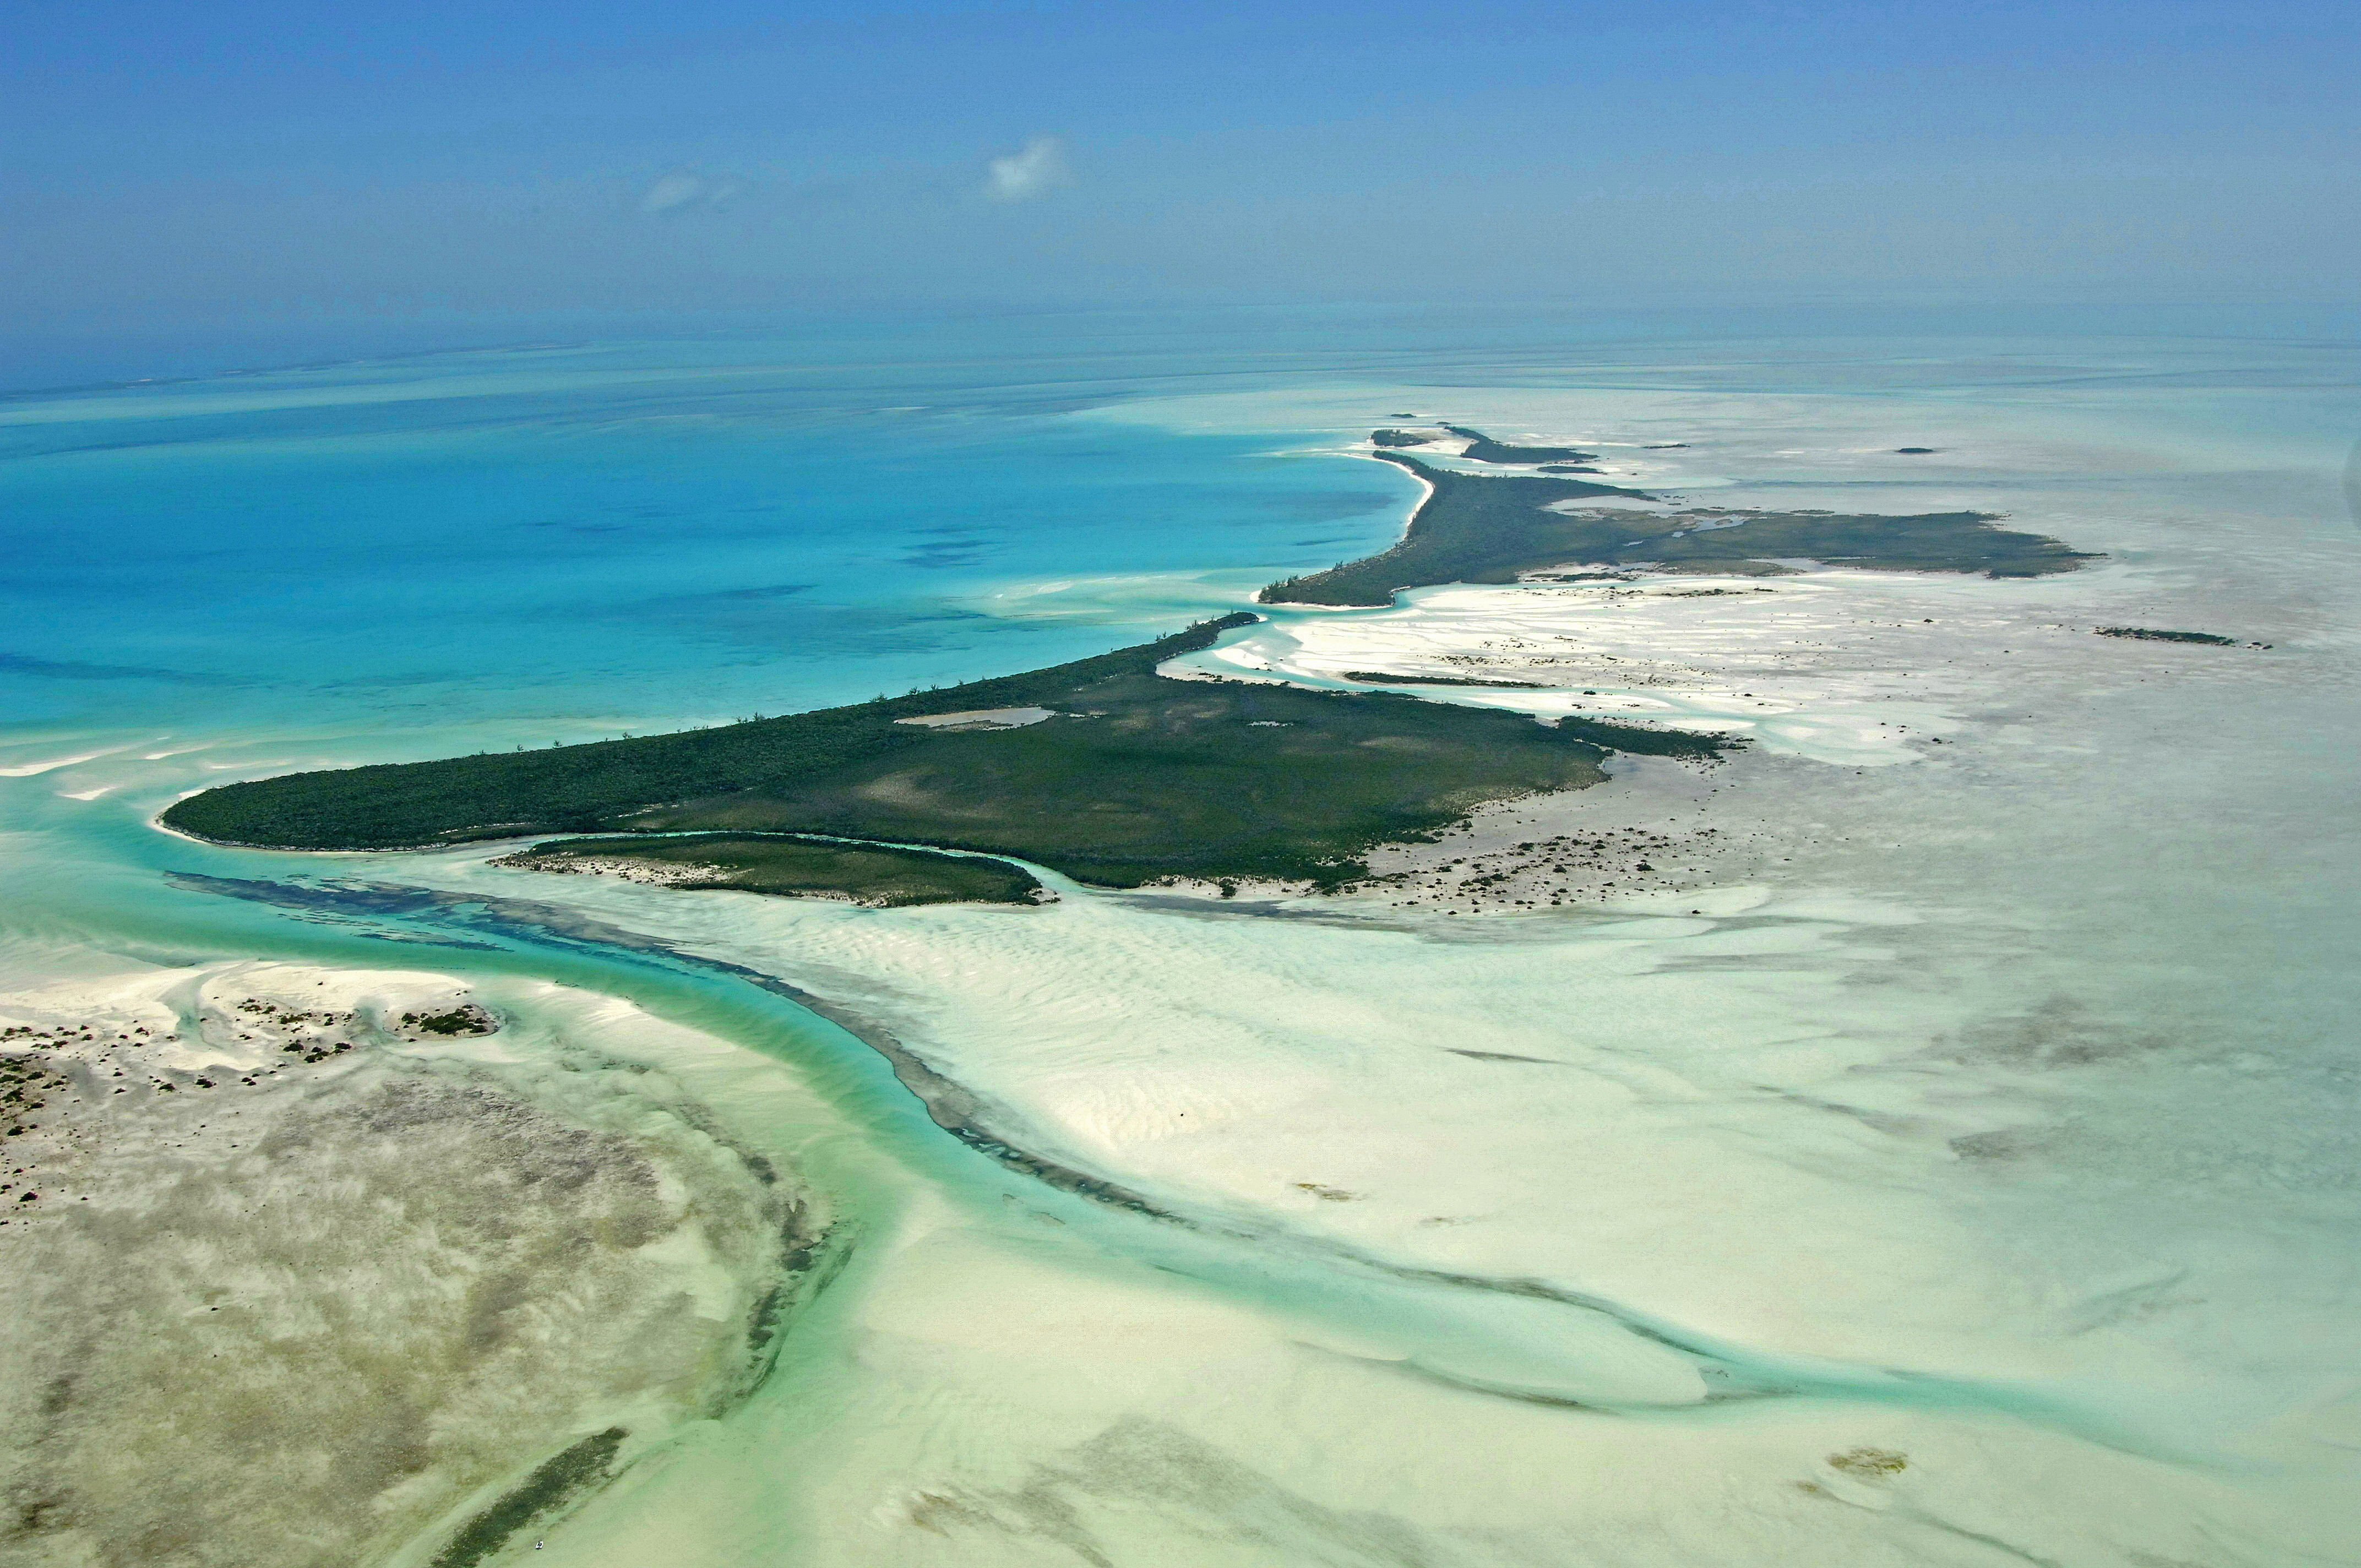 Ambergris Cay Harbor in BE, Bahamas - harbor Reviews - Phone